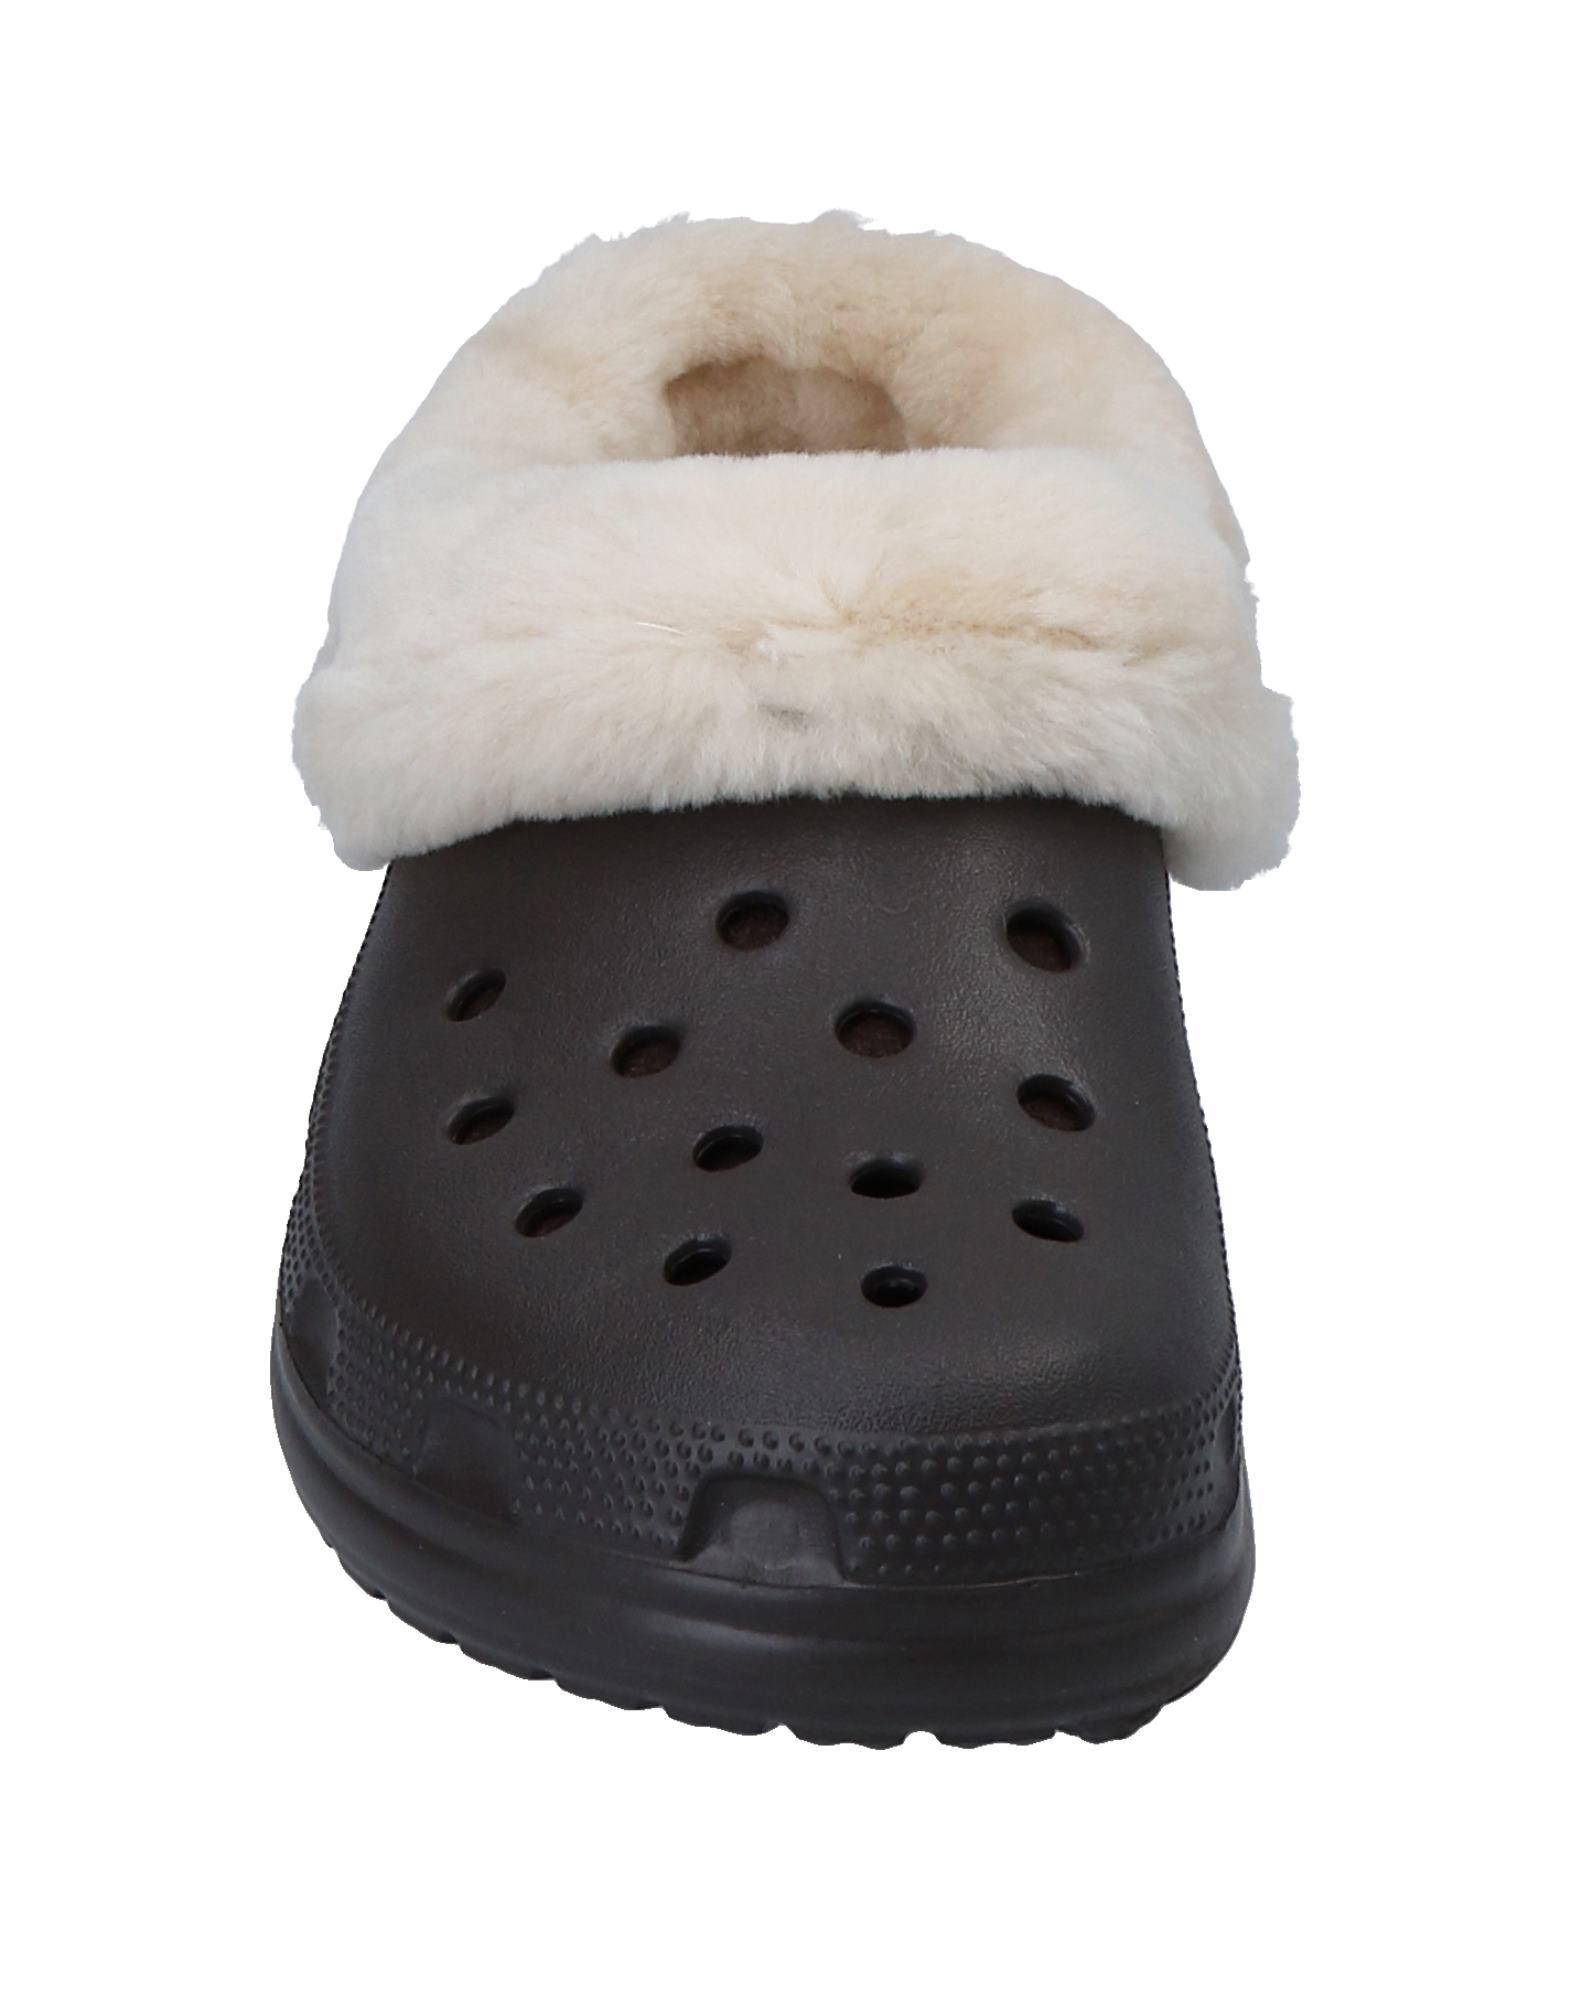 Crocs Sandalen Sandalen Crocs Herren  11550295CU e0741a